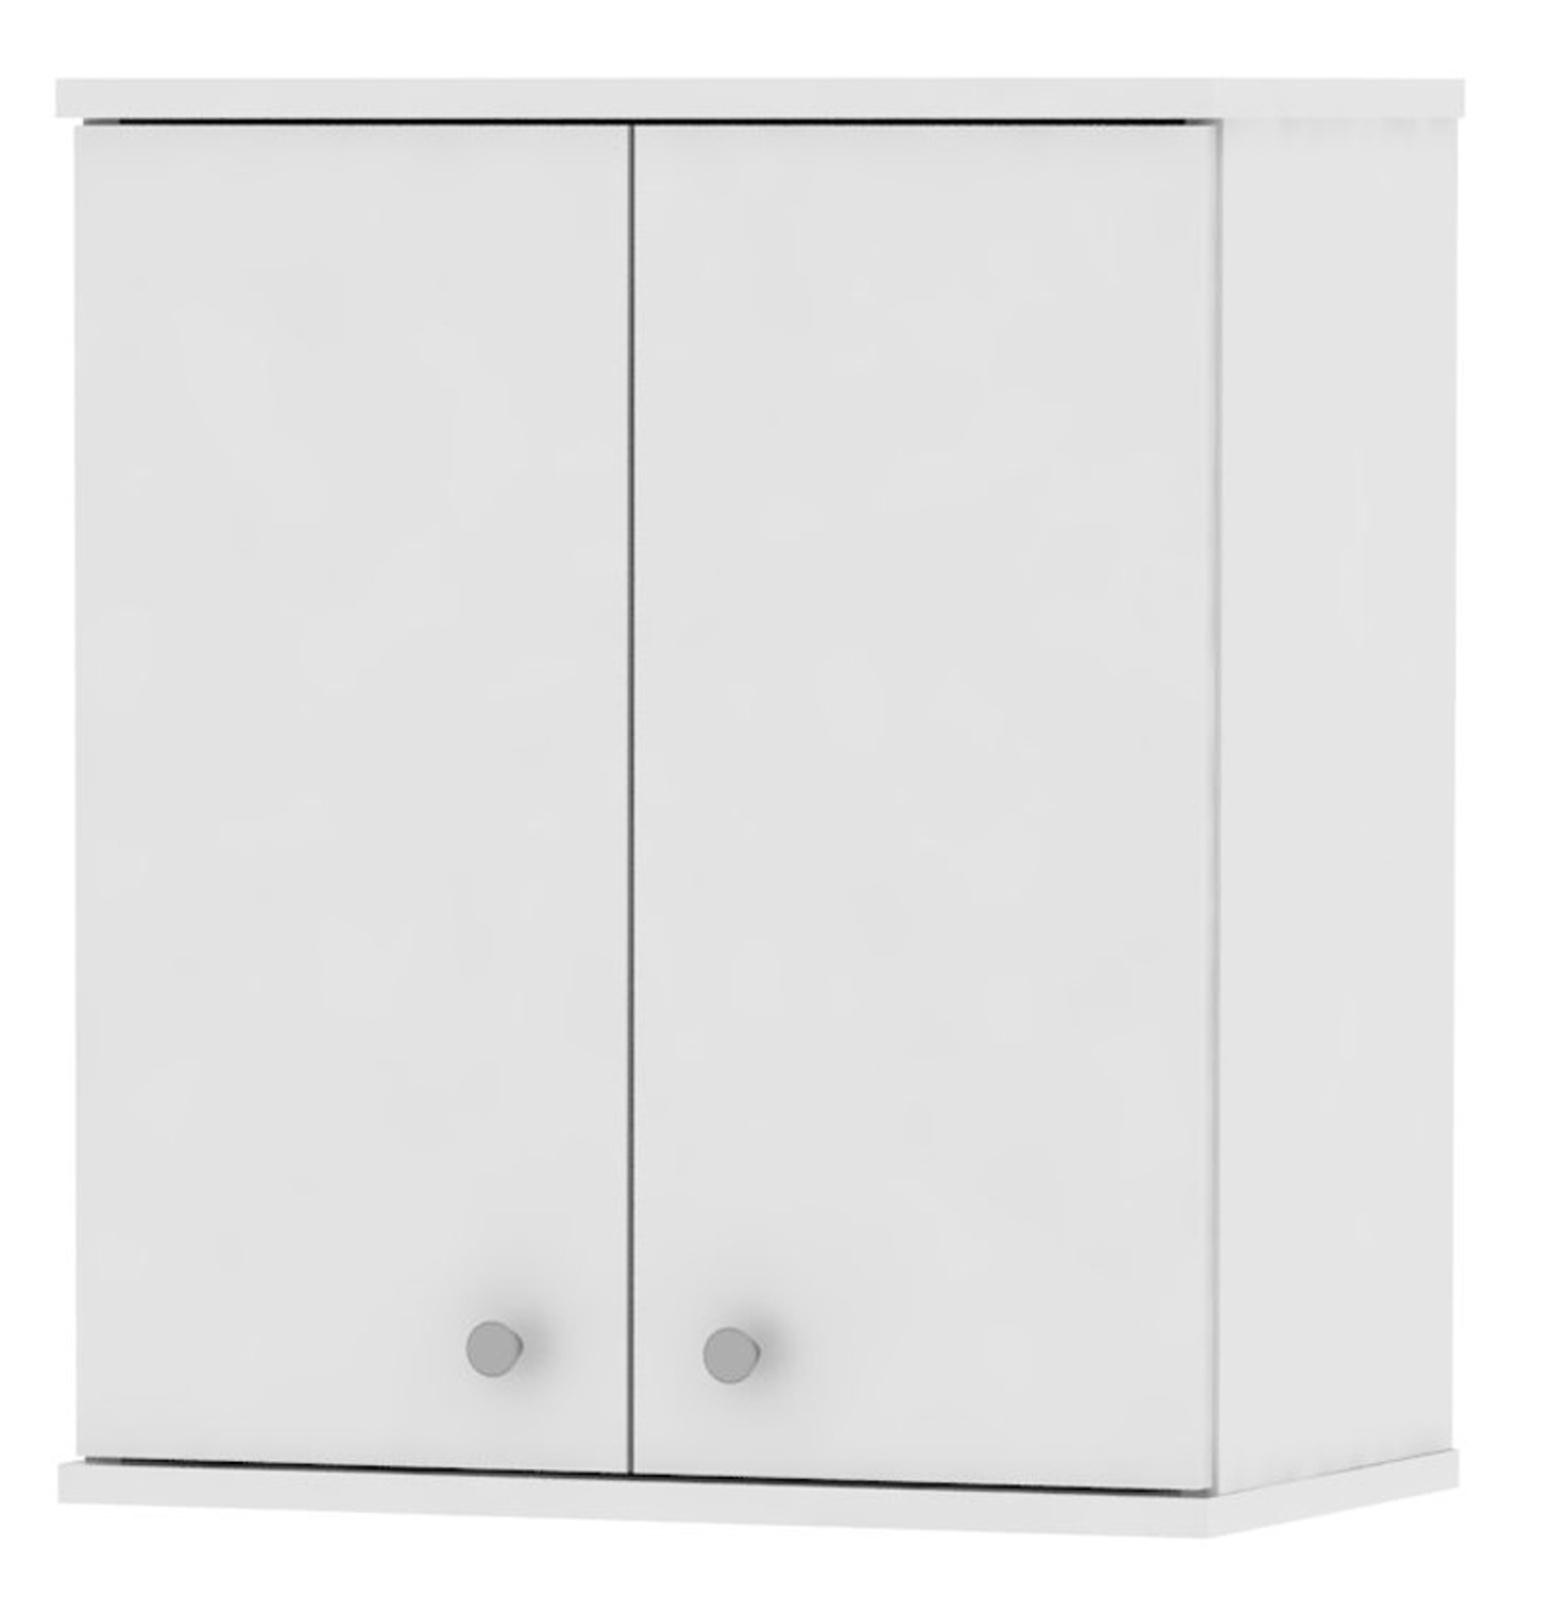 Horní závěsná skříňka, bílá, GALENA SI08